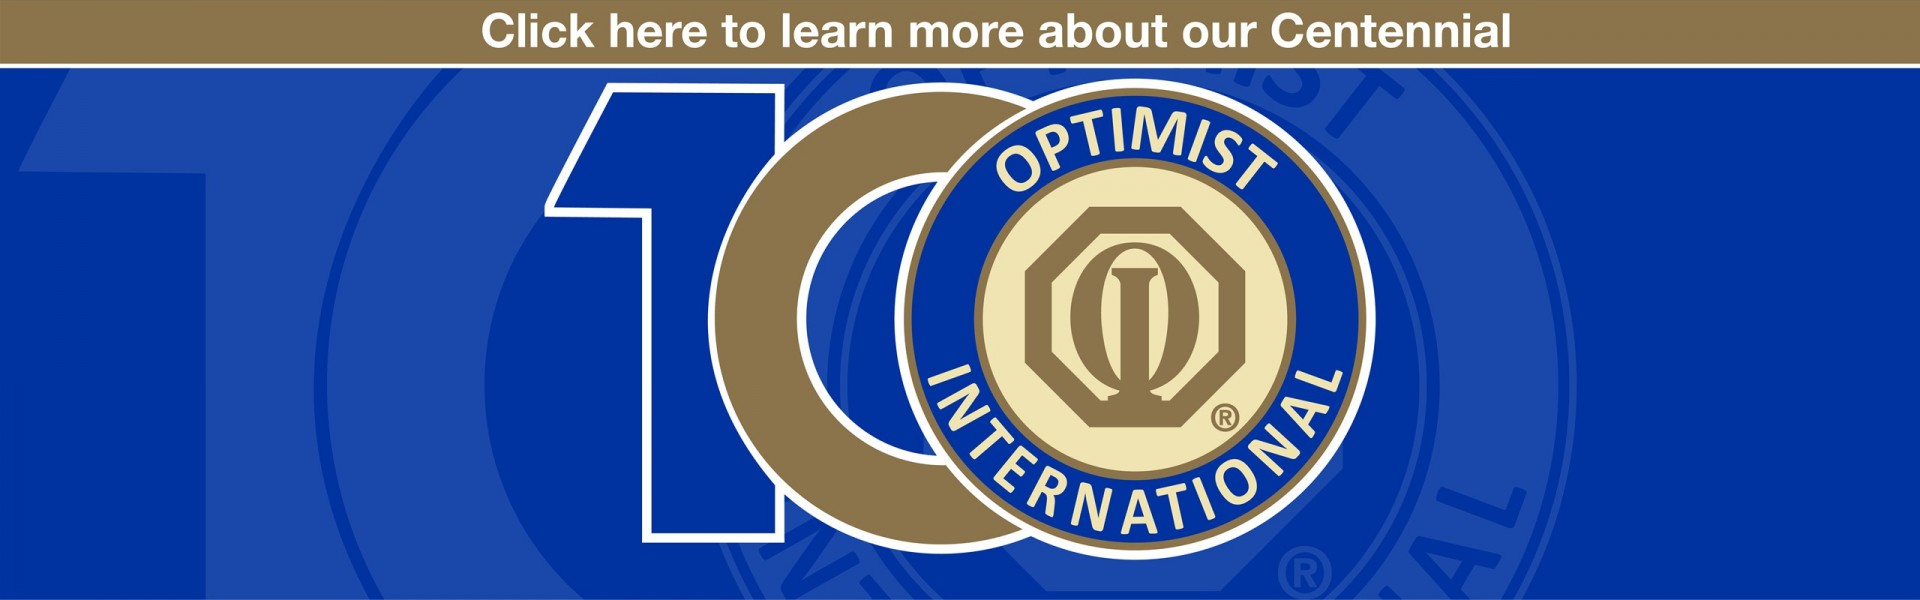 009 Essay Example Centennial Optimist International Wondrous Contest Winners Due Date Oratorical 1920